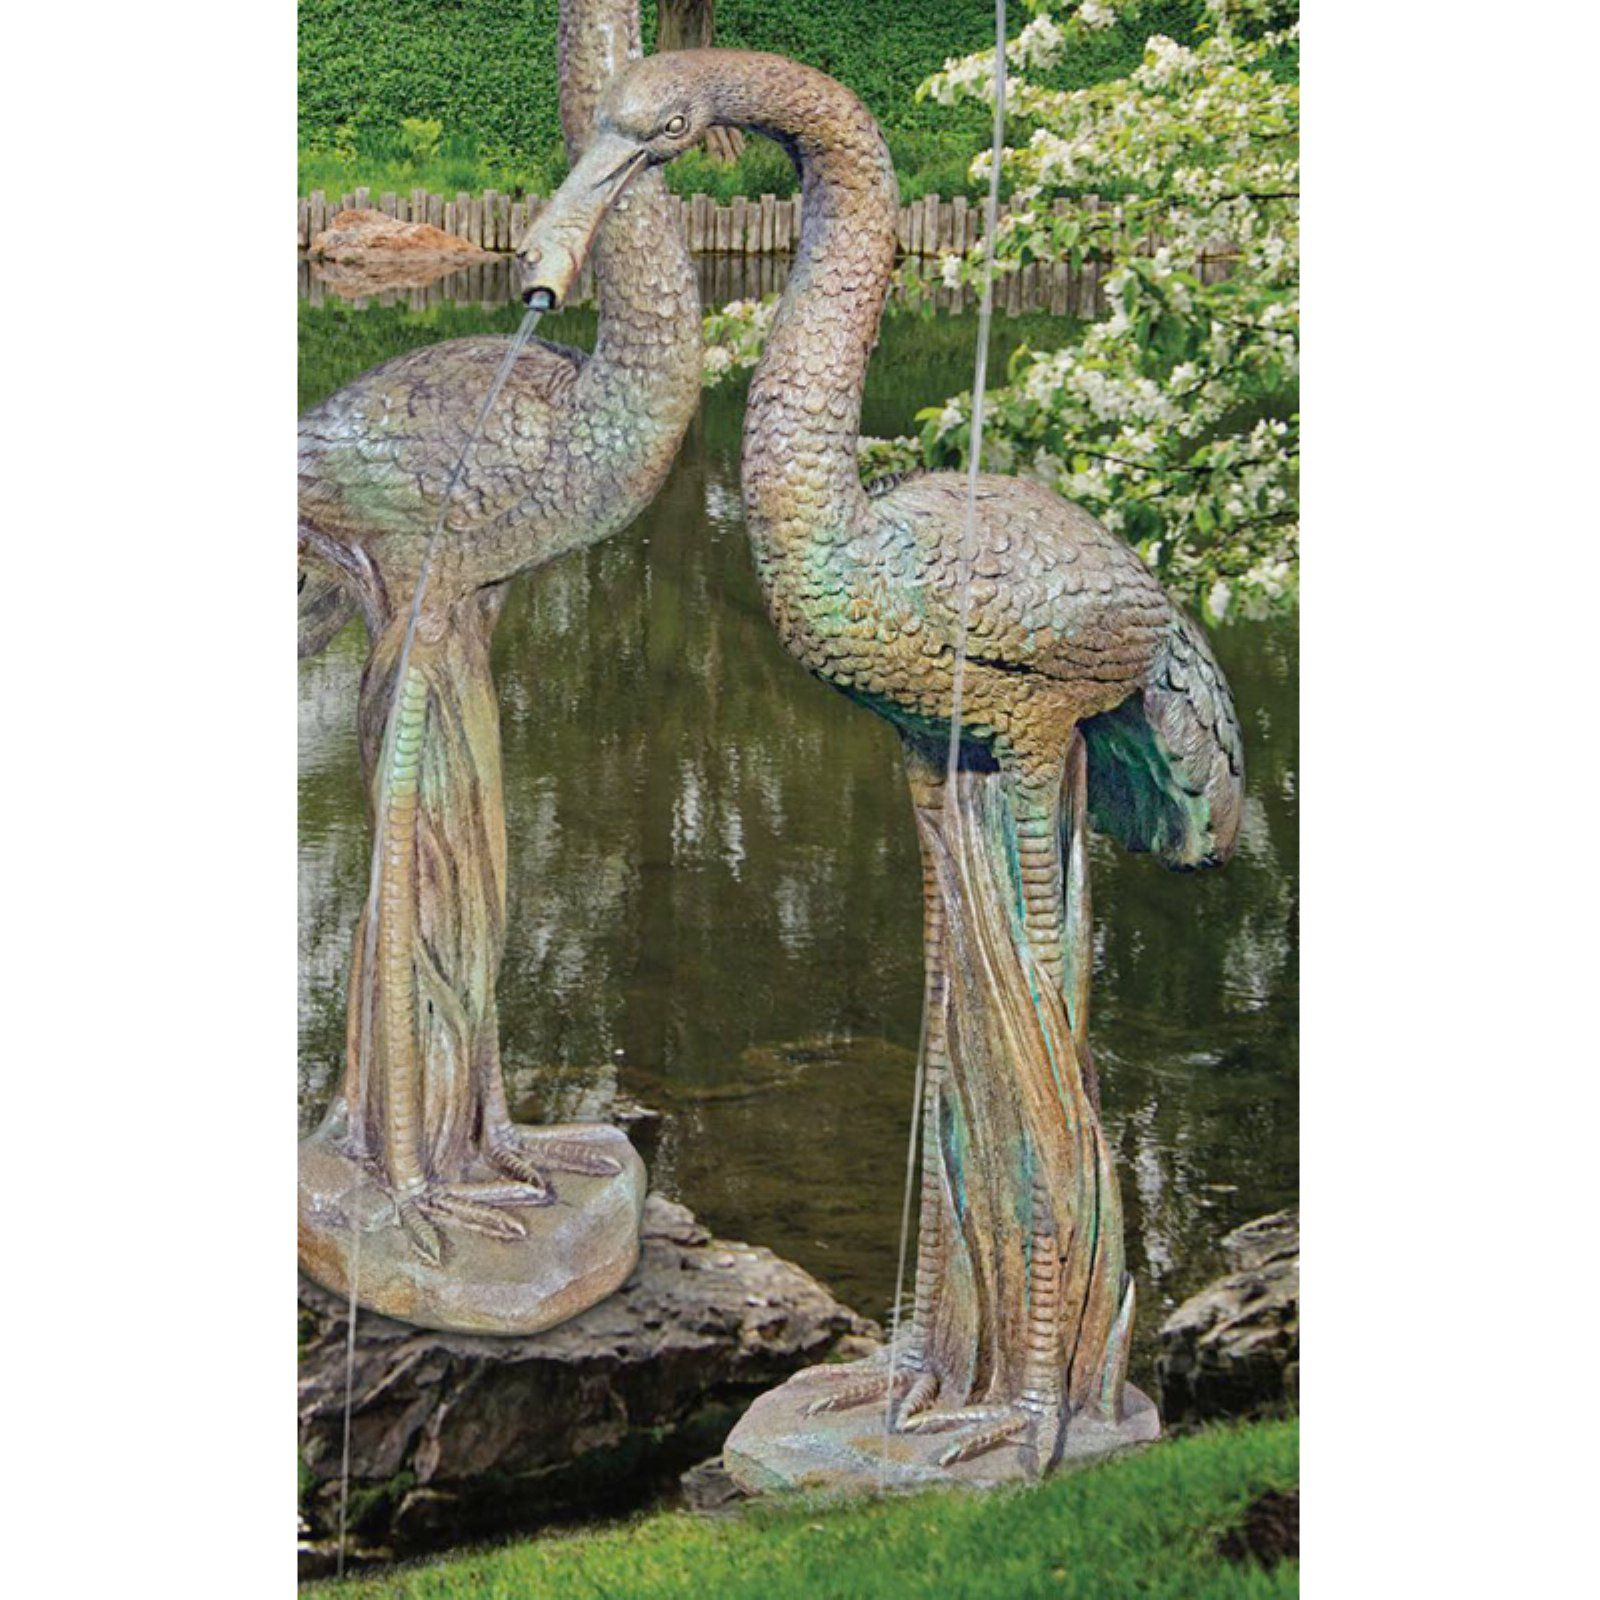 Henri Studio Female Crane Garden Statue Garden Gnomes 400 x 300